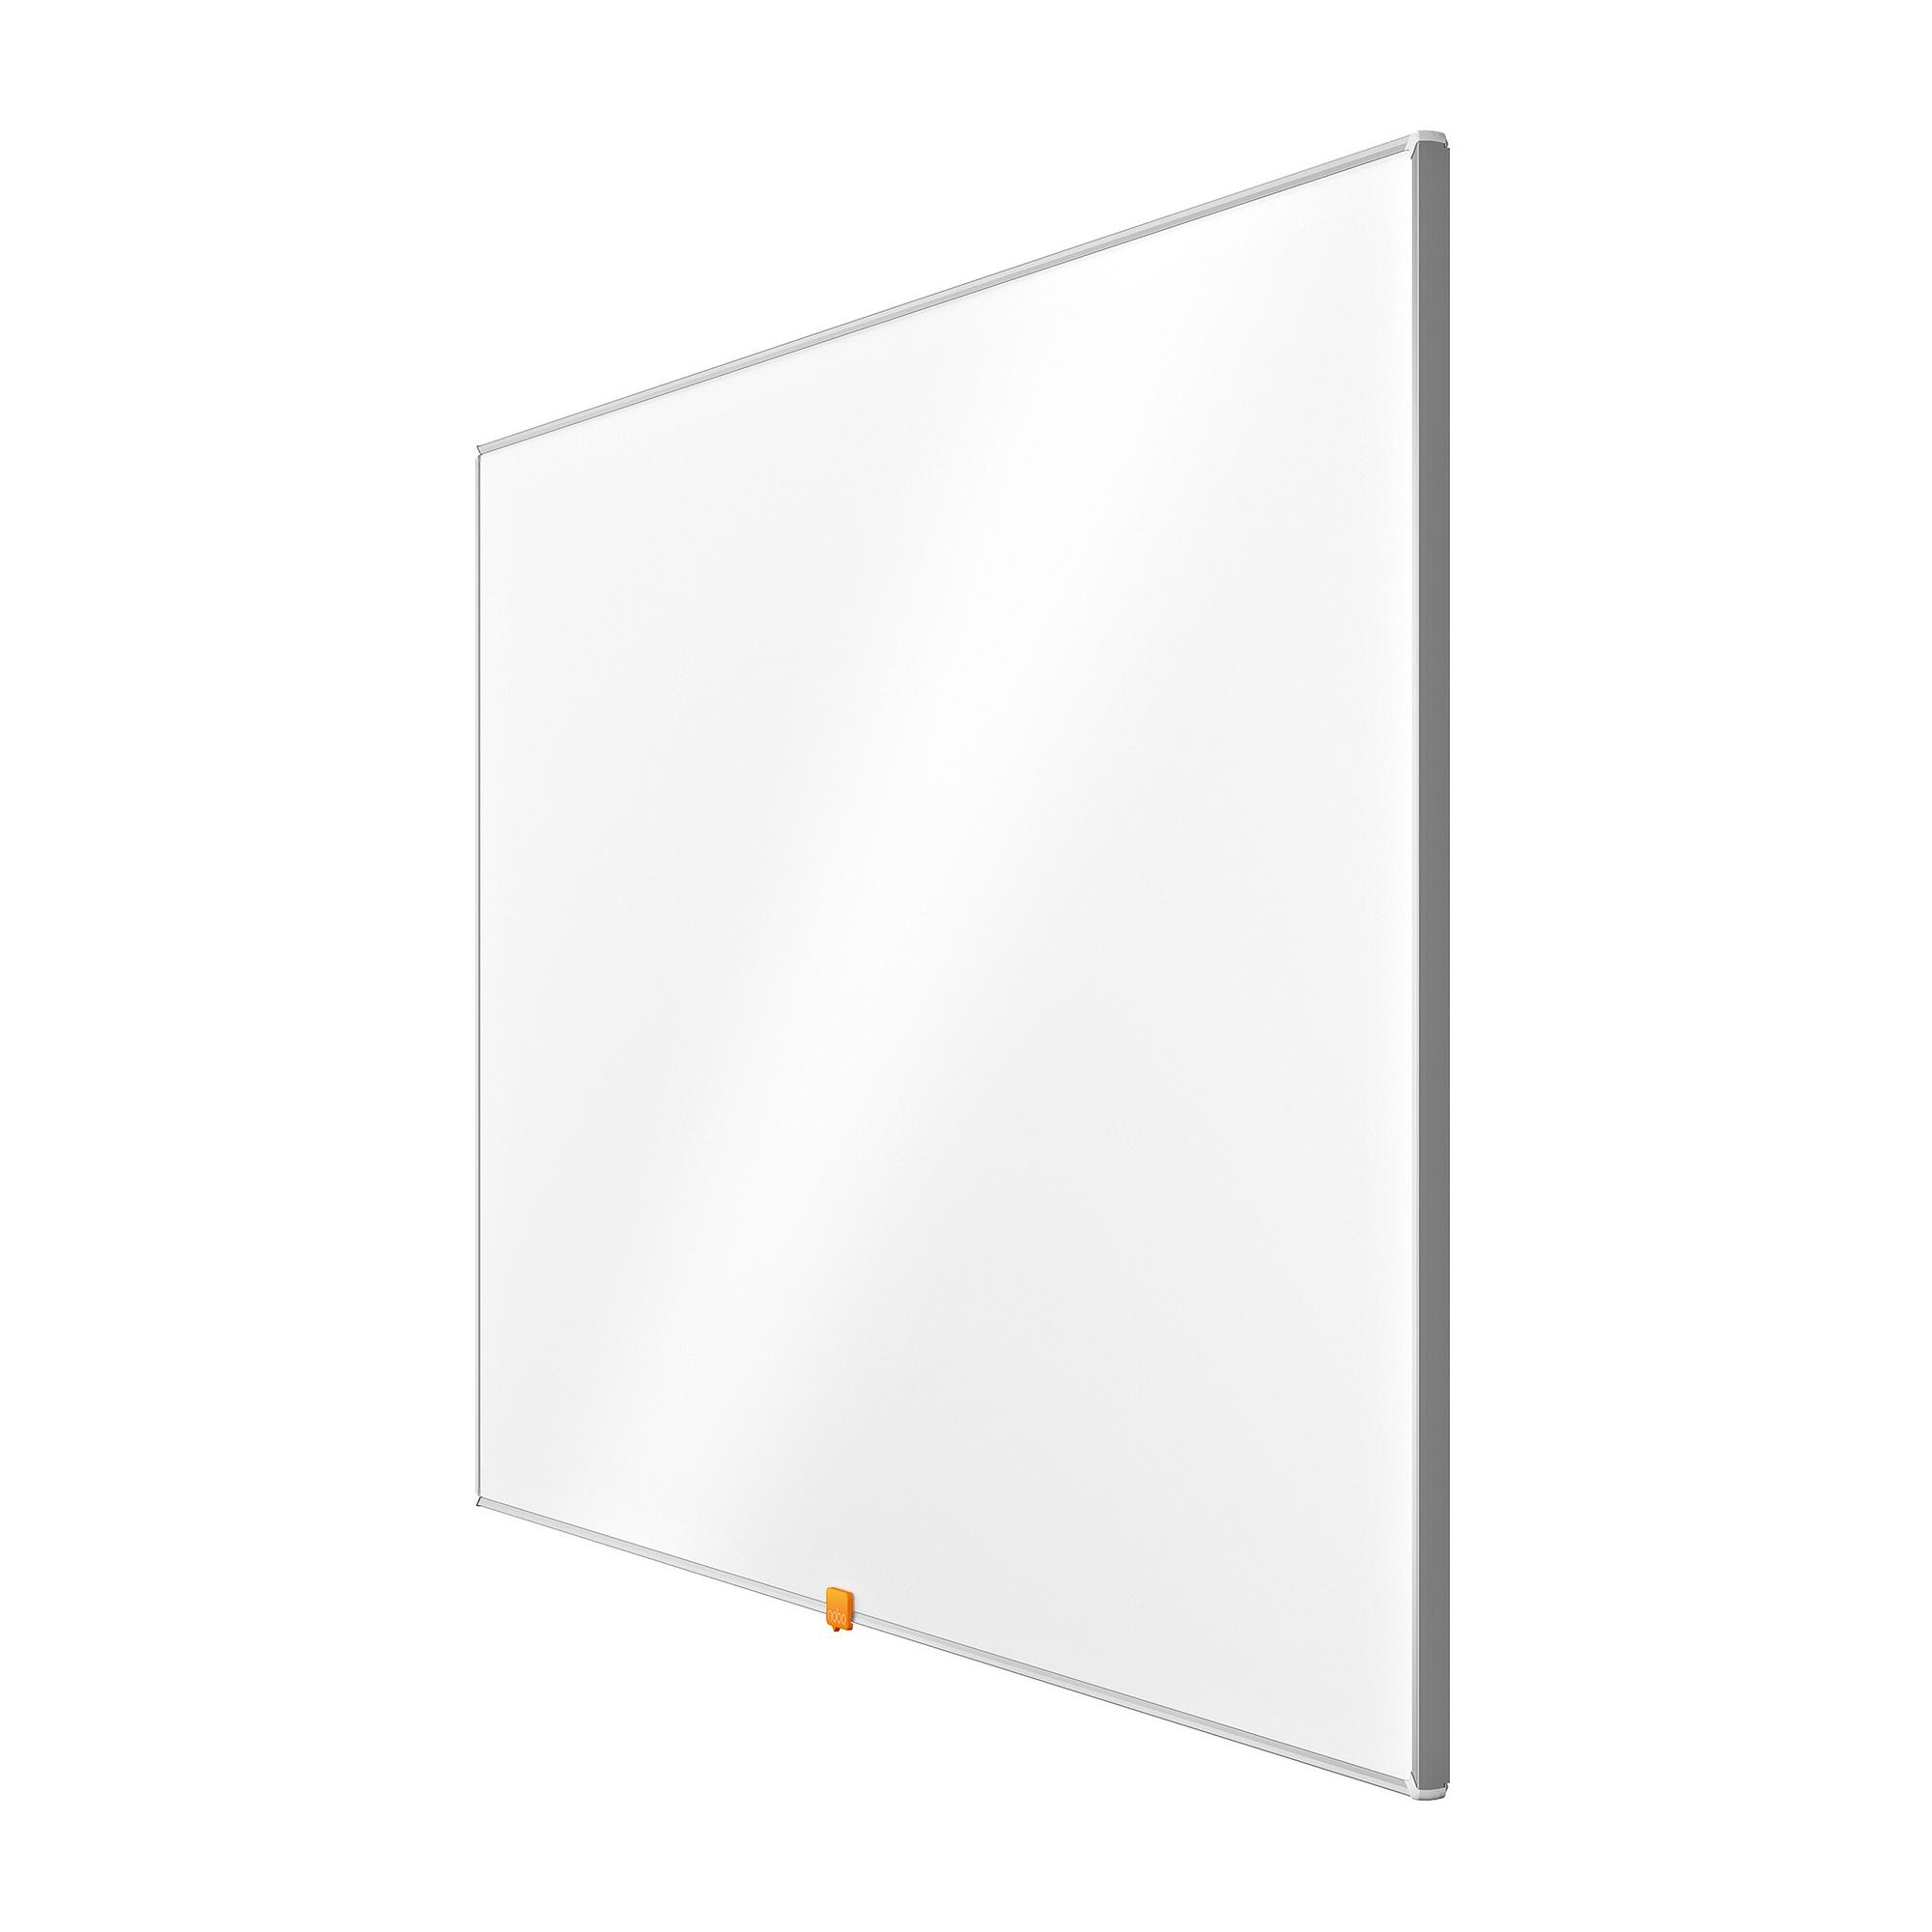 Nobo Widescreen 70 inch Whiteboard Nano Clean Magnetic Steel 1561x883mm Ref 1905299